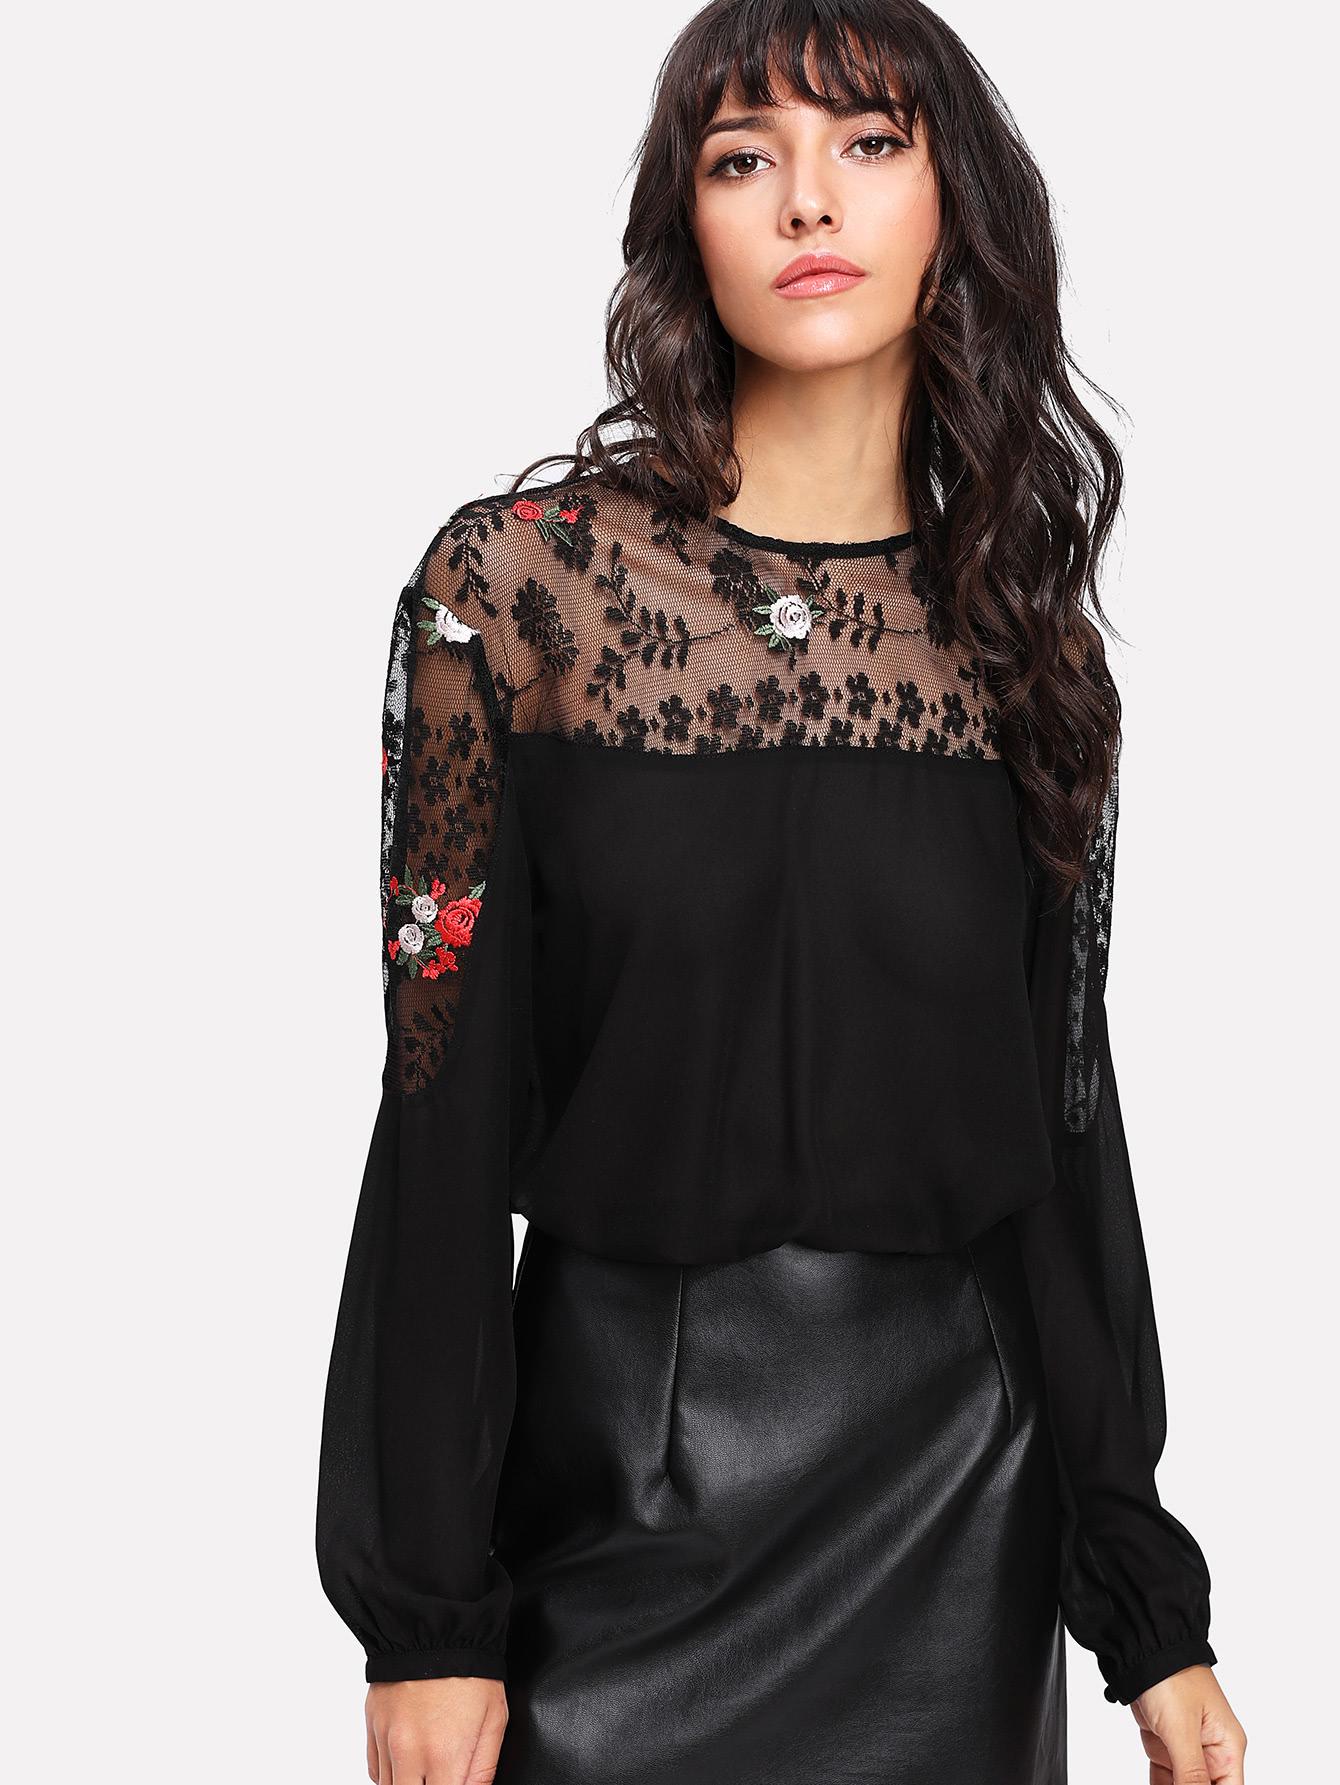 Embroidered Lace Yoke Keyhole Back Top lace yoke buttoned back top